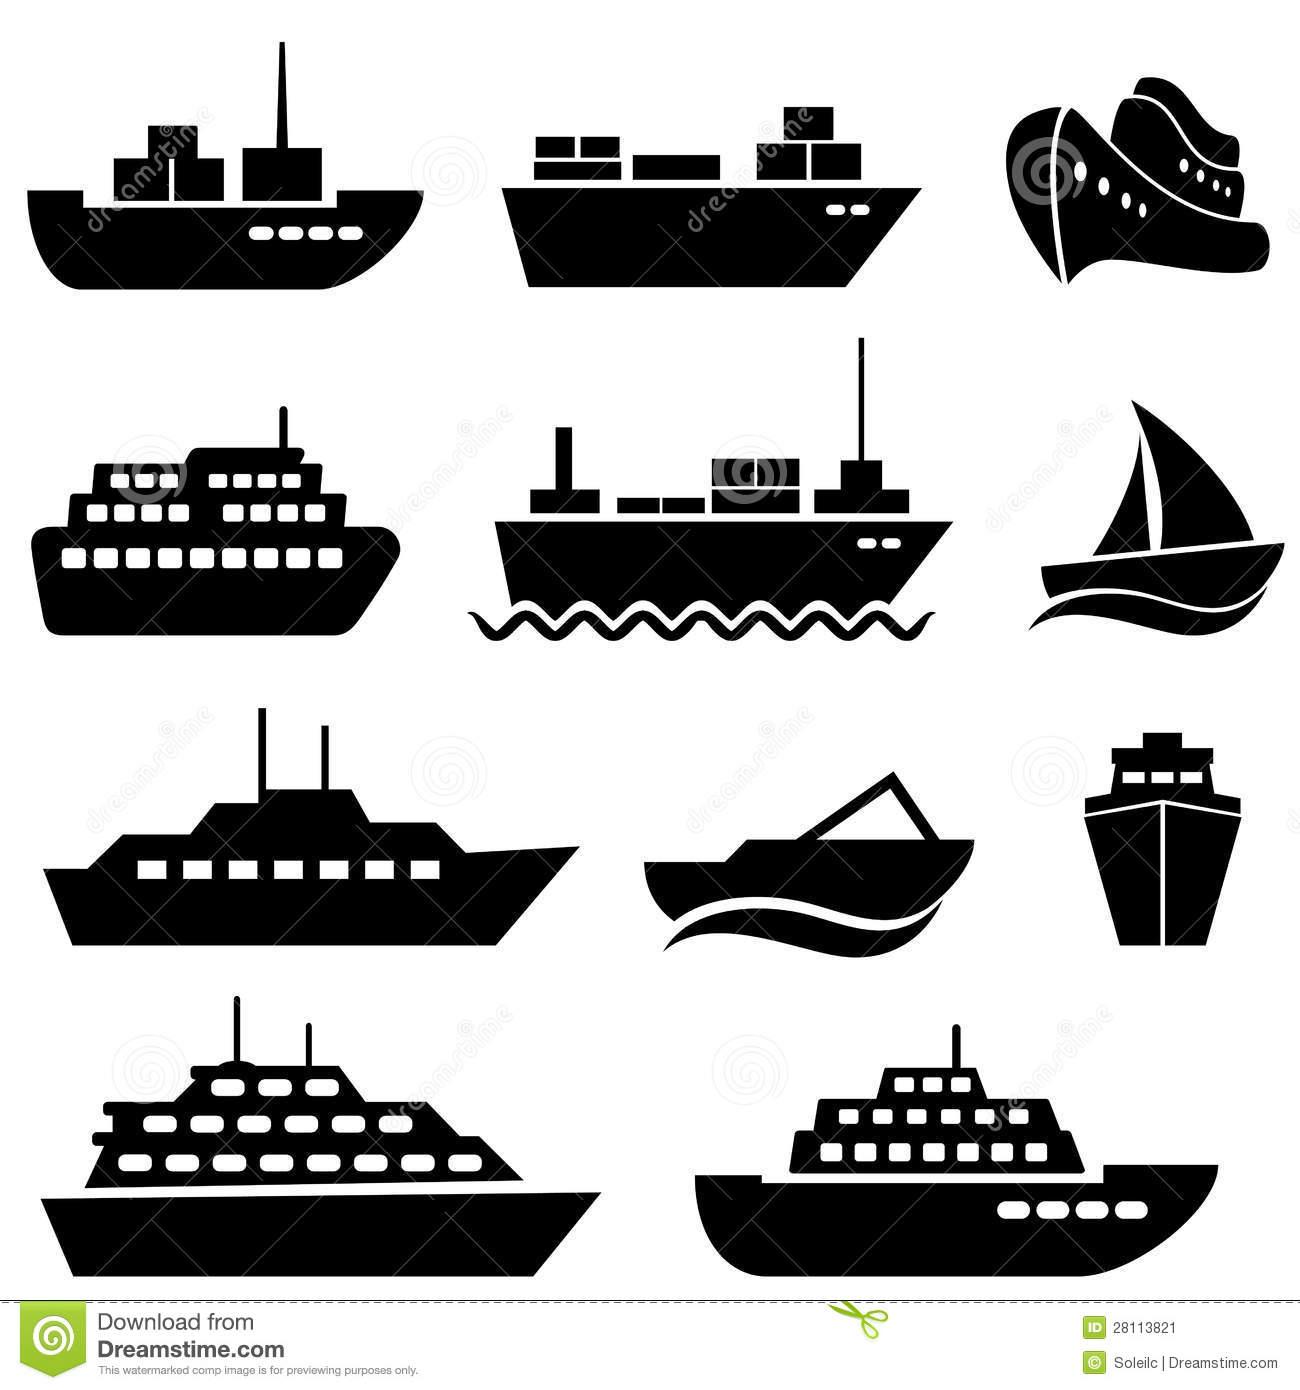 Cargo Ship Icon Black and White